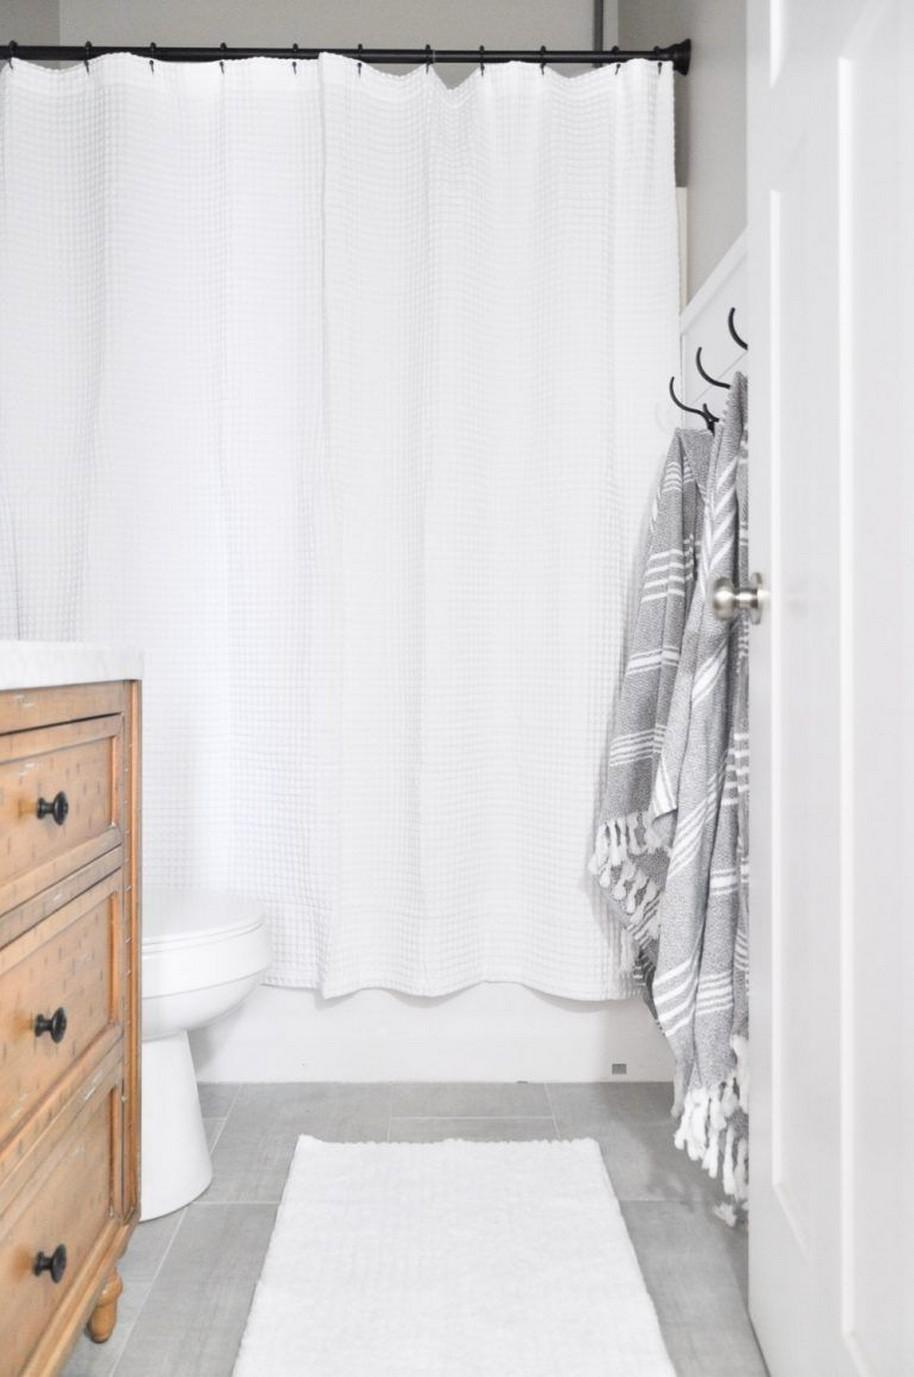 83 Modern Bathroom Design Some Tips Home Decor 38